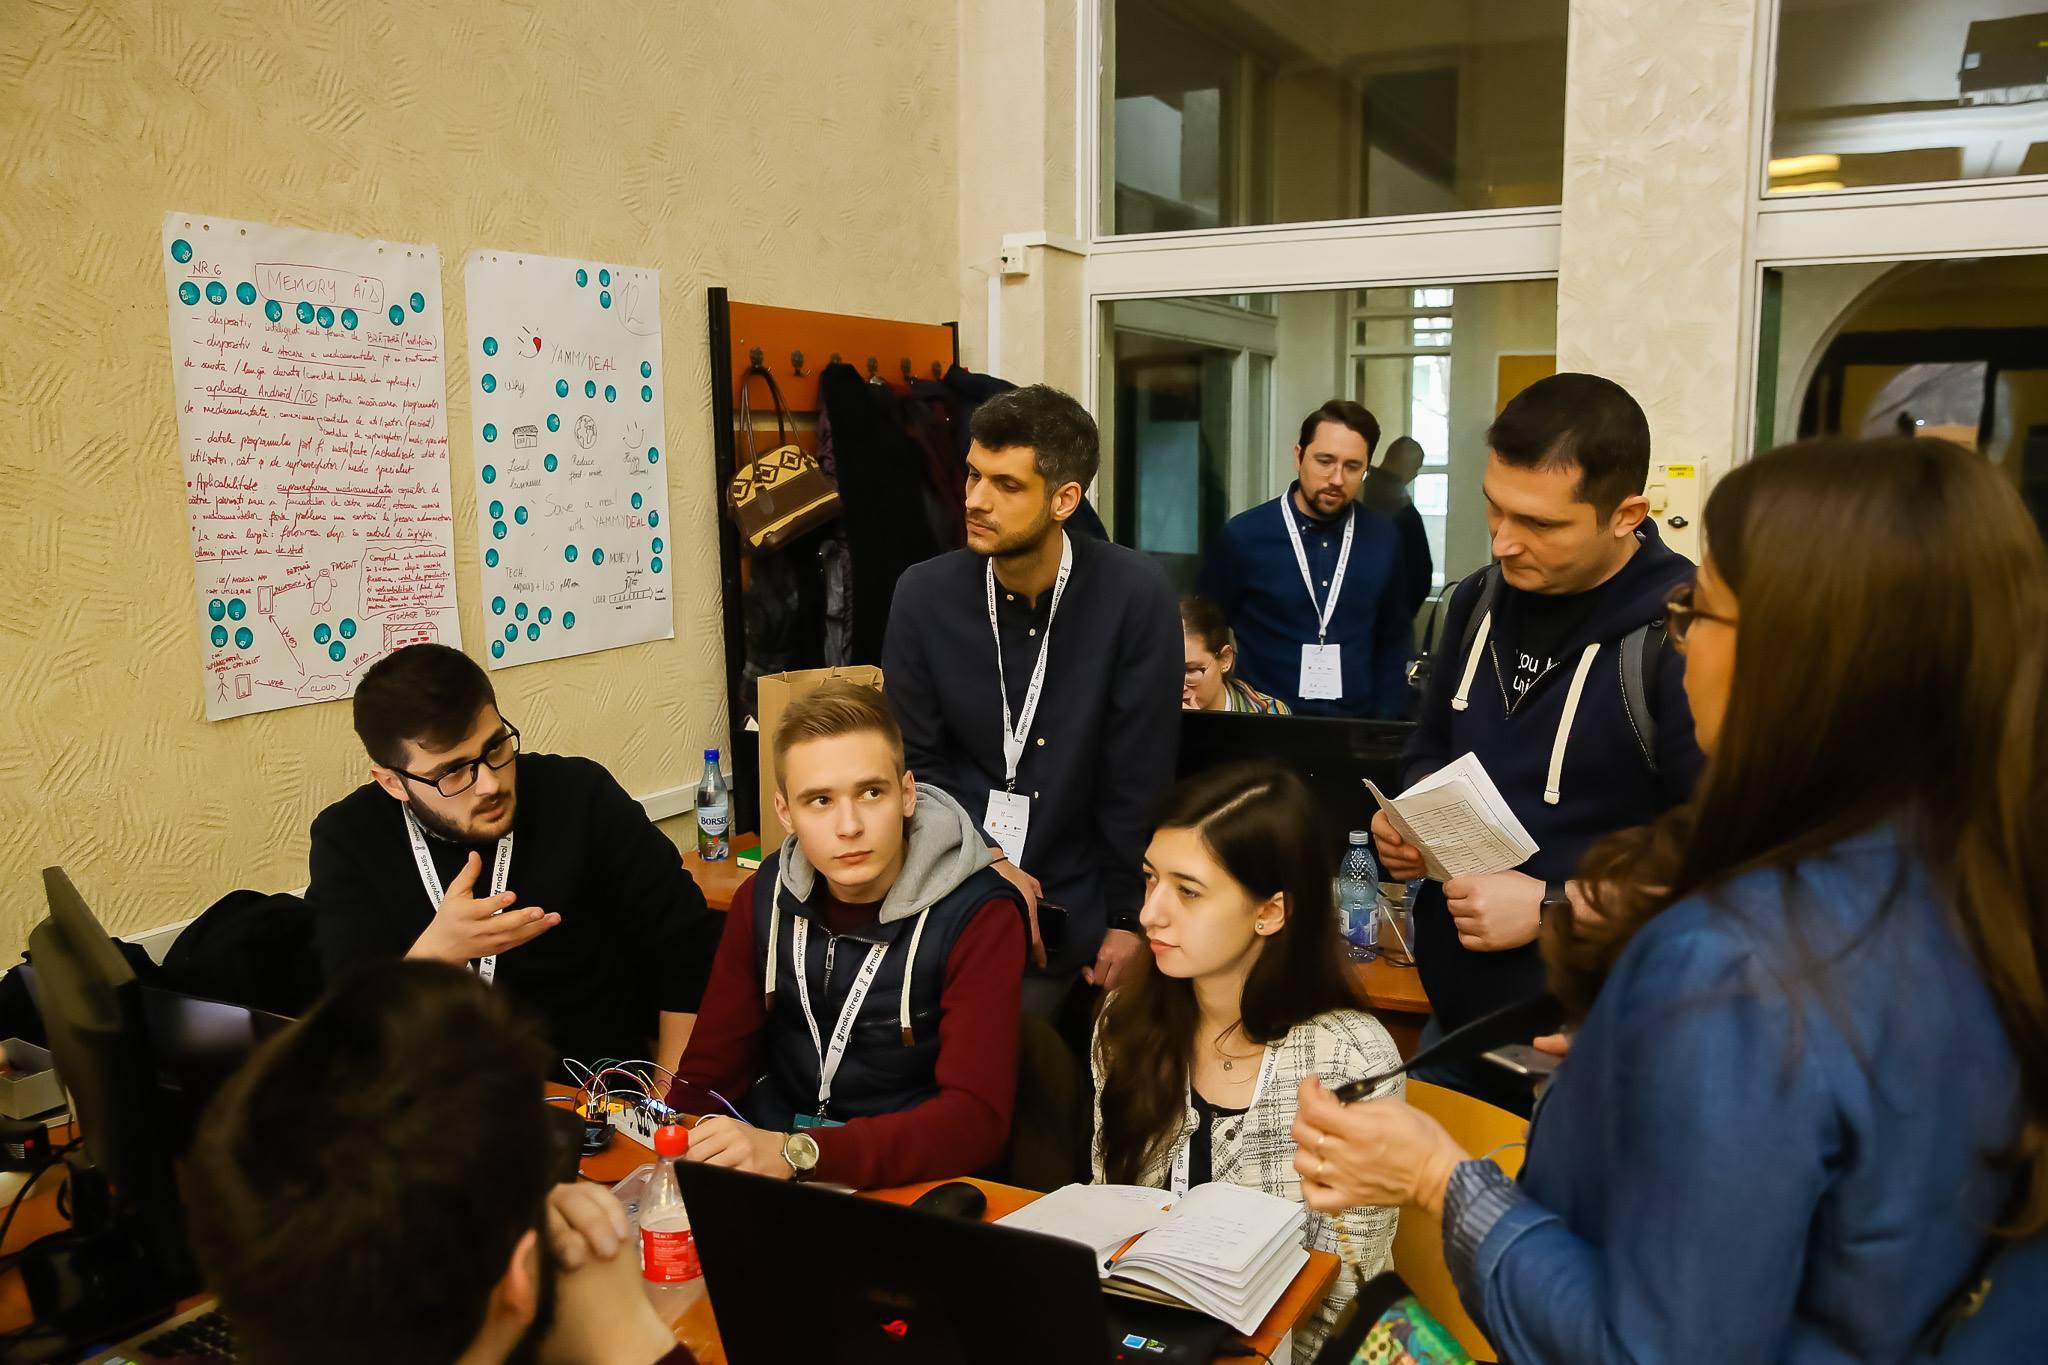 Innovation Labs 2018 Hackathon paul padurariu www.paulpadurariu.ro fotograf profesionist evenimente Iasi 27